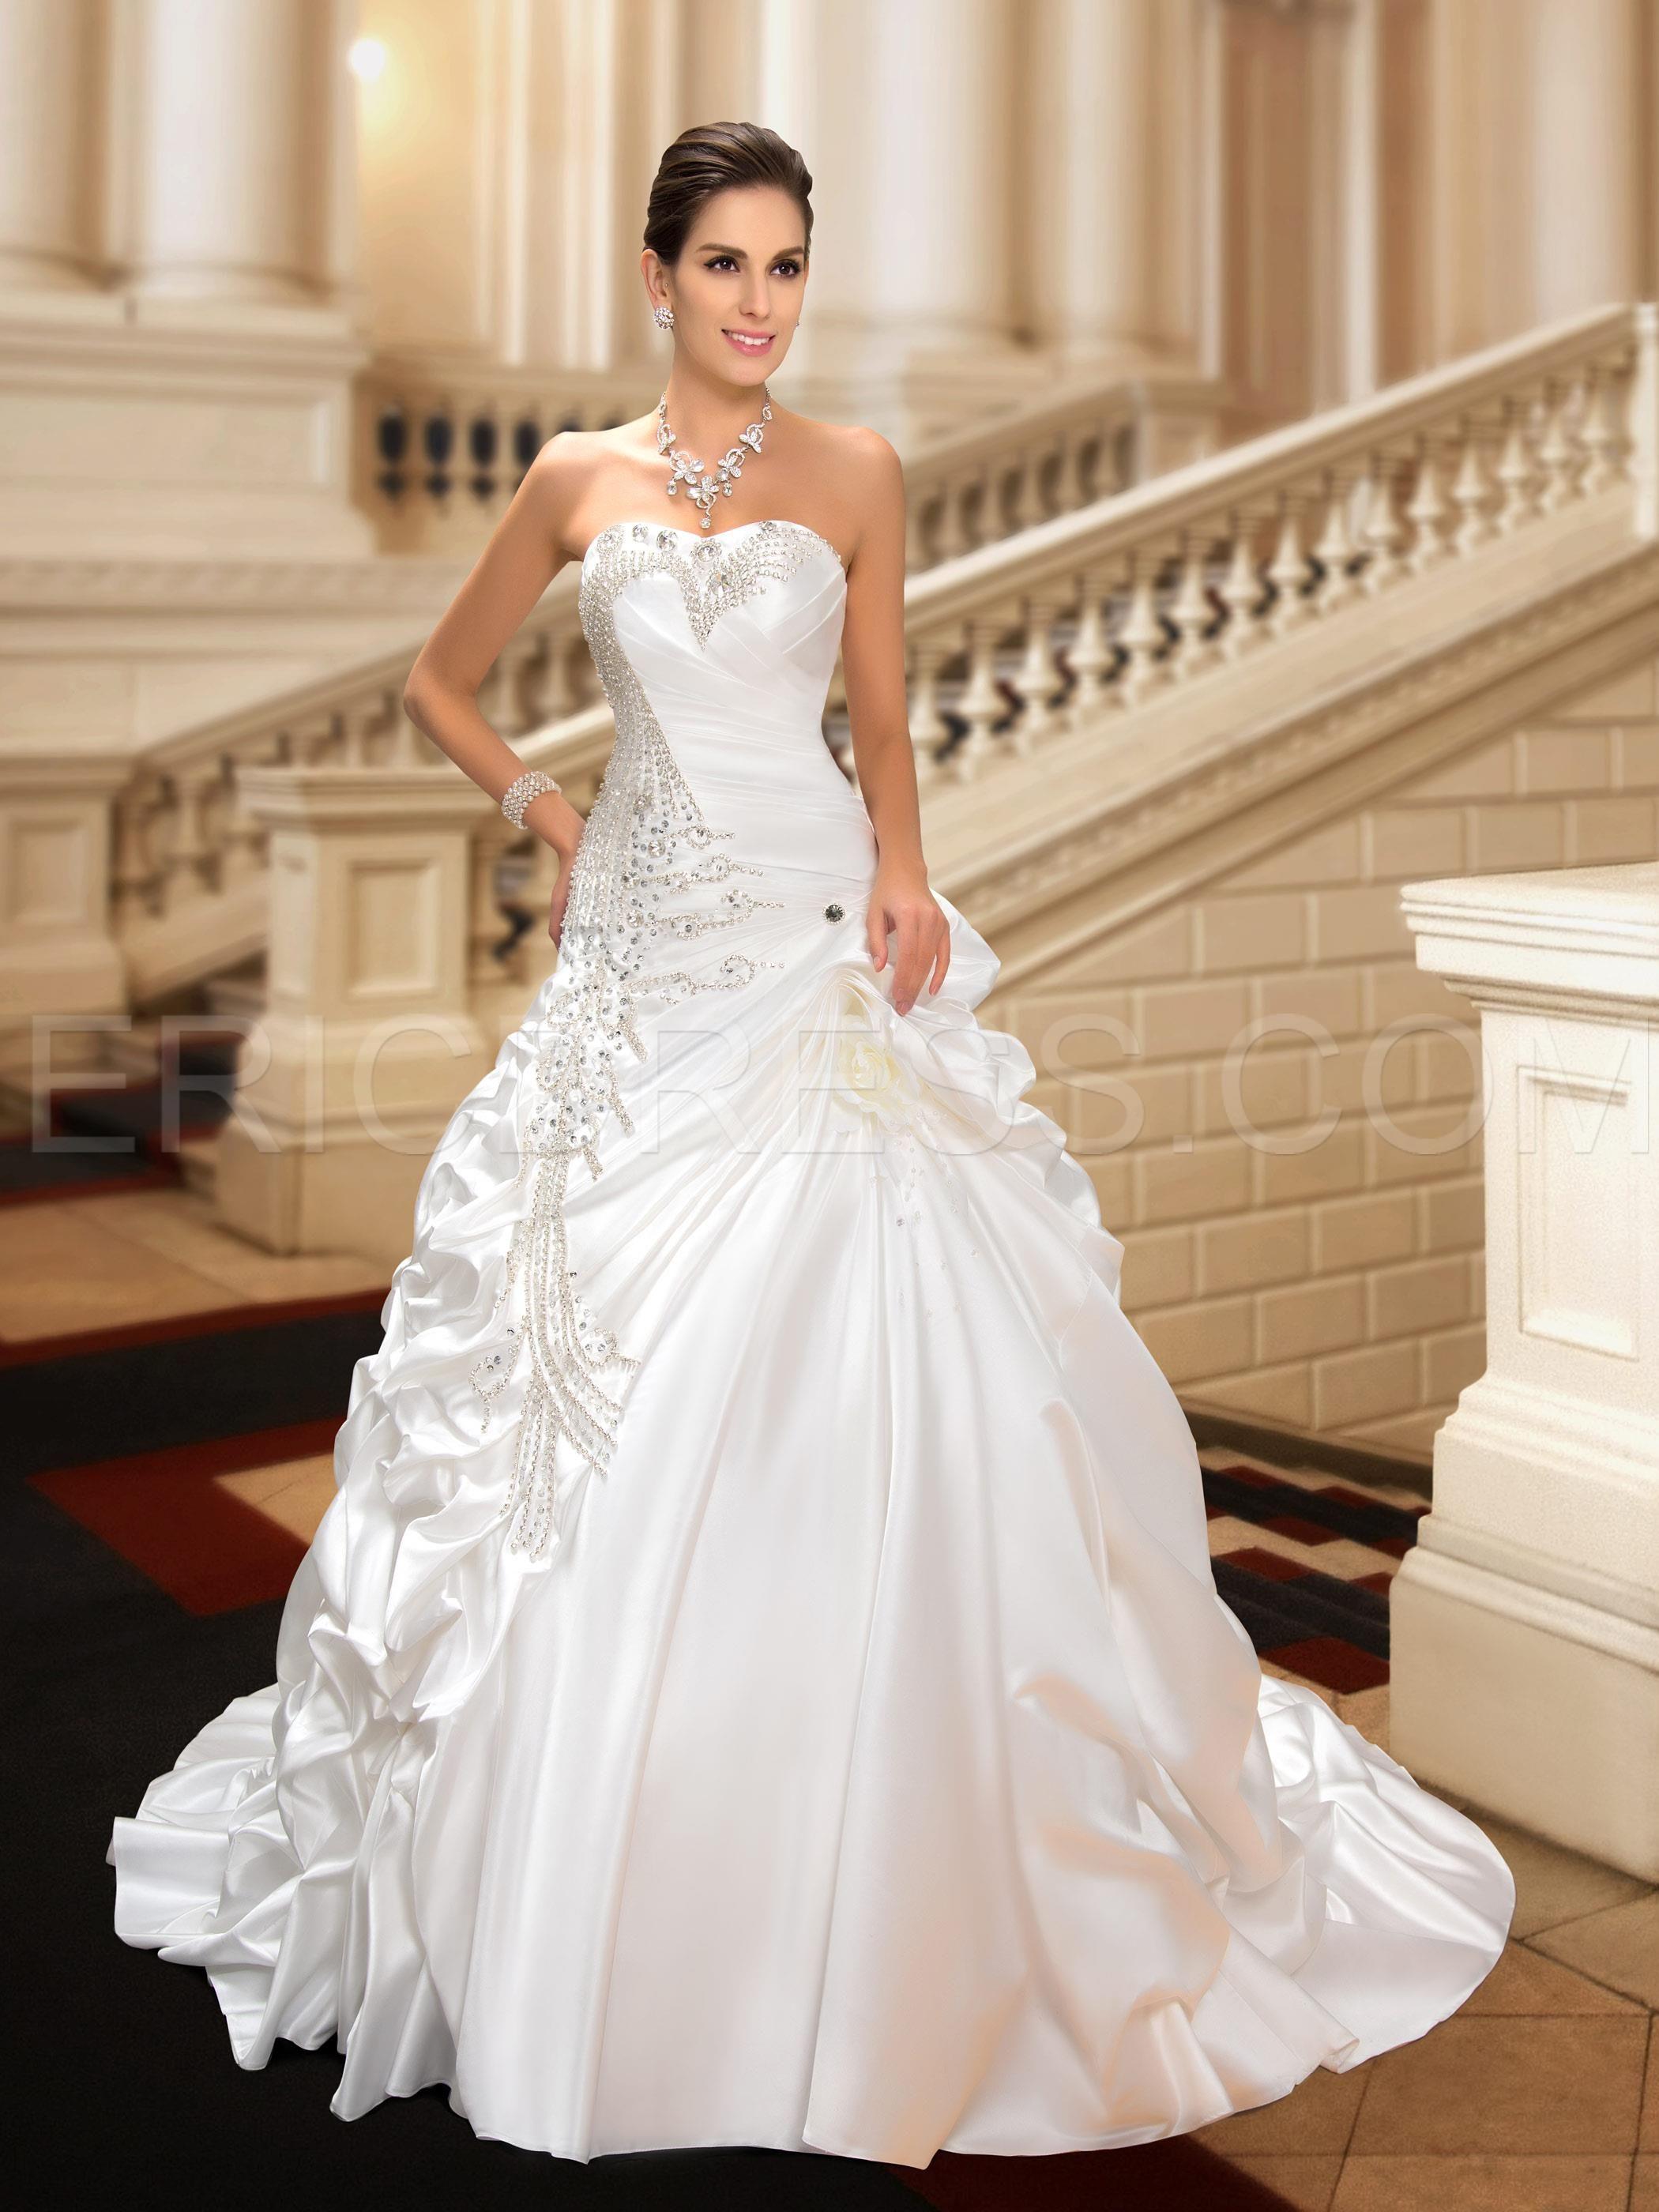 Glamorous Sweetheart Crystal Ball Gown Wedding Dress | Wedding dress ...